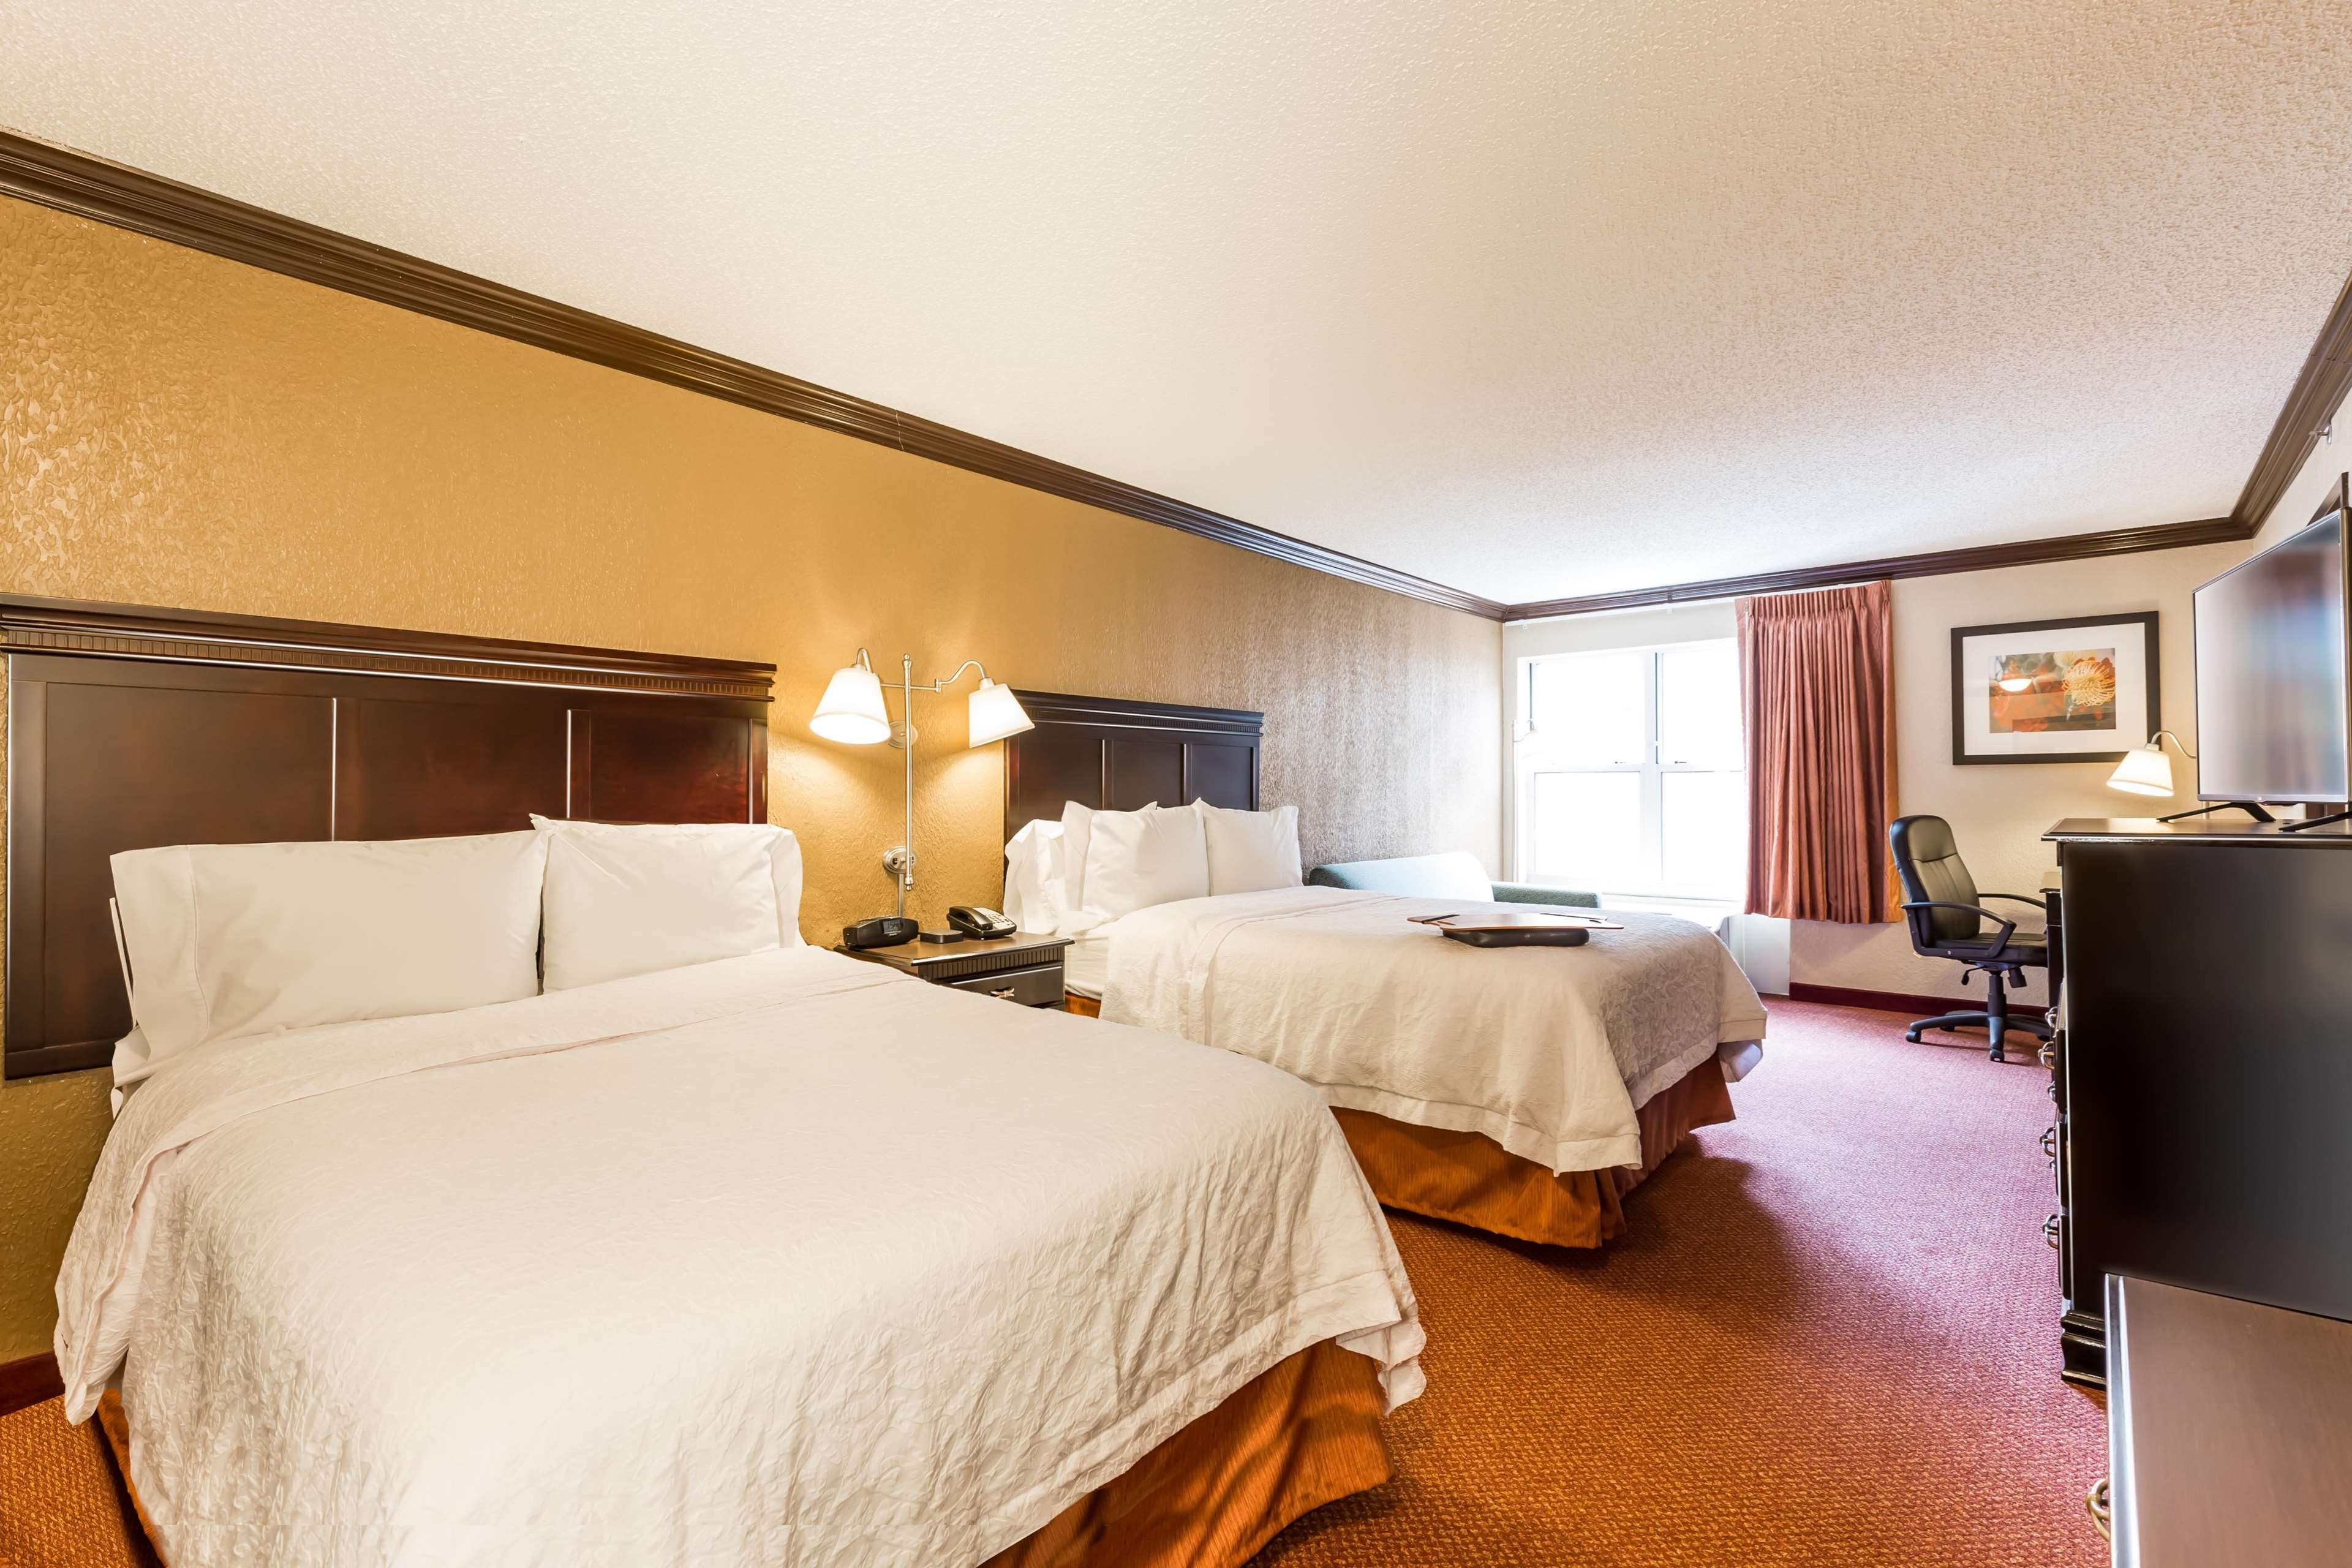 Hampton Inn & Suites Chicago/Hoffman Estates image 35